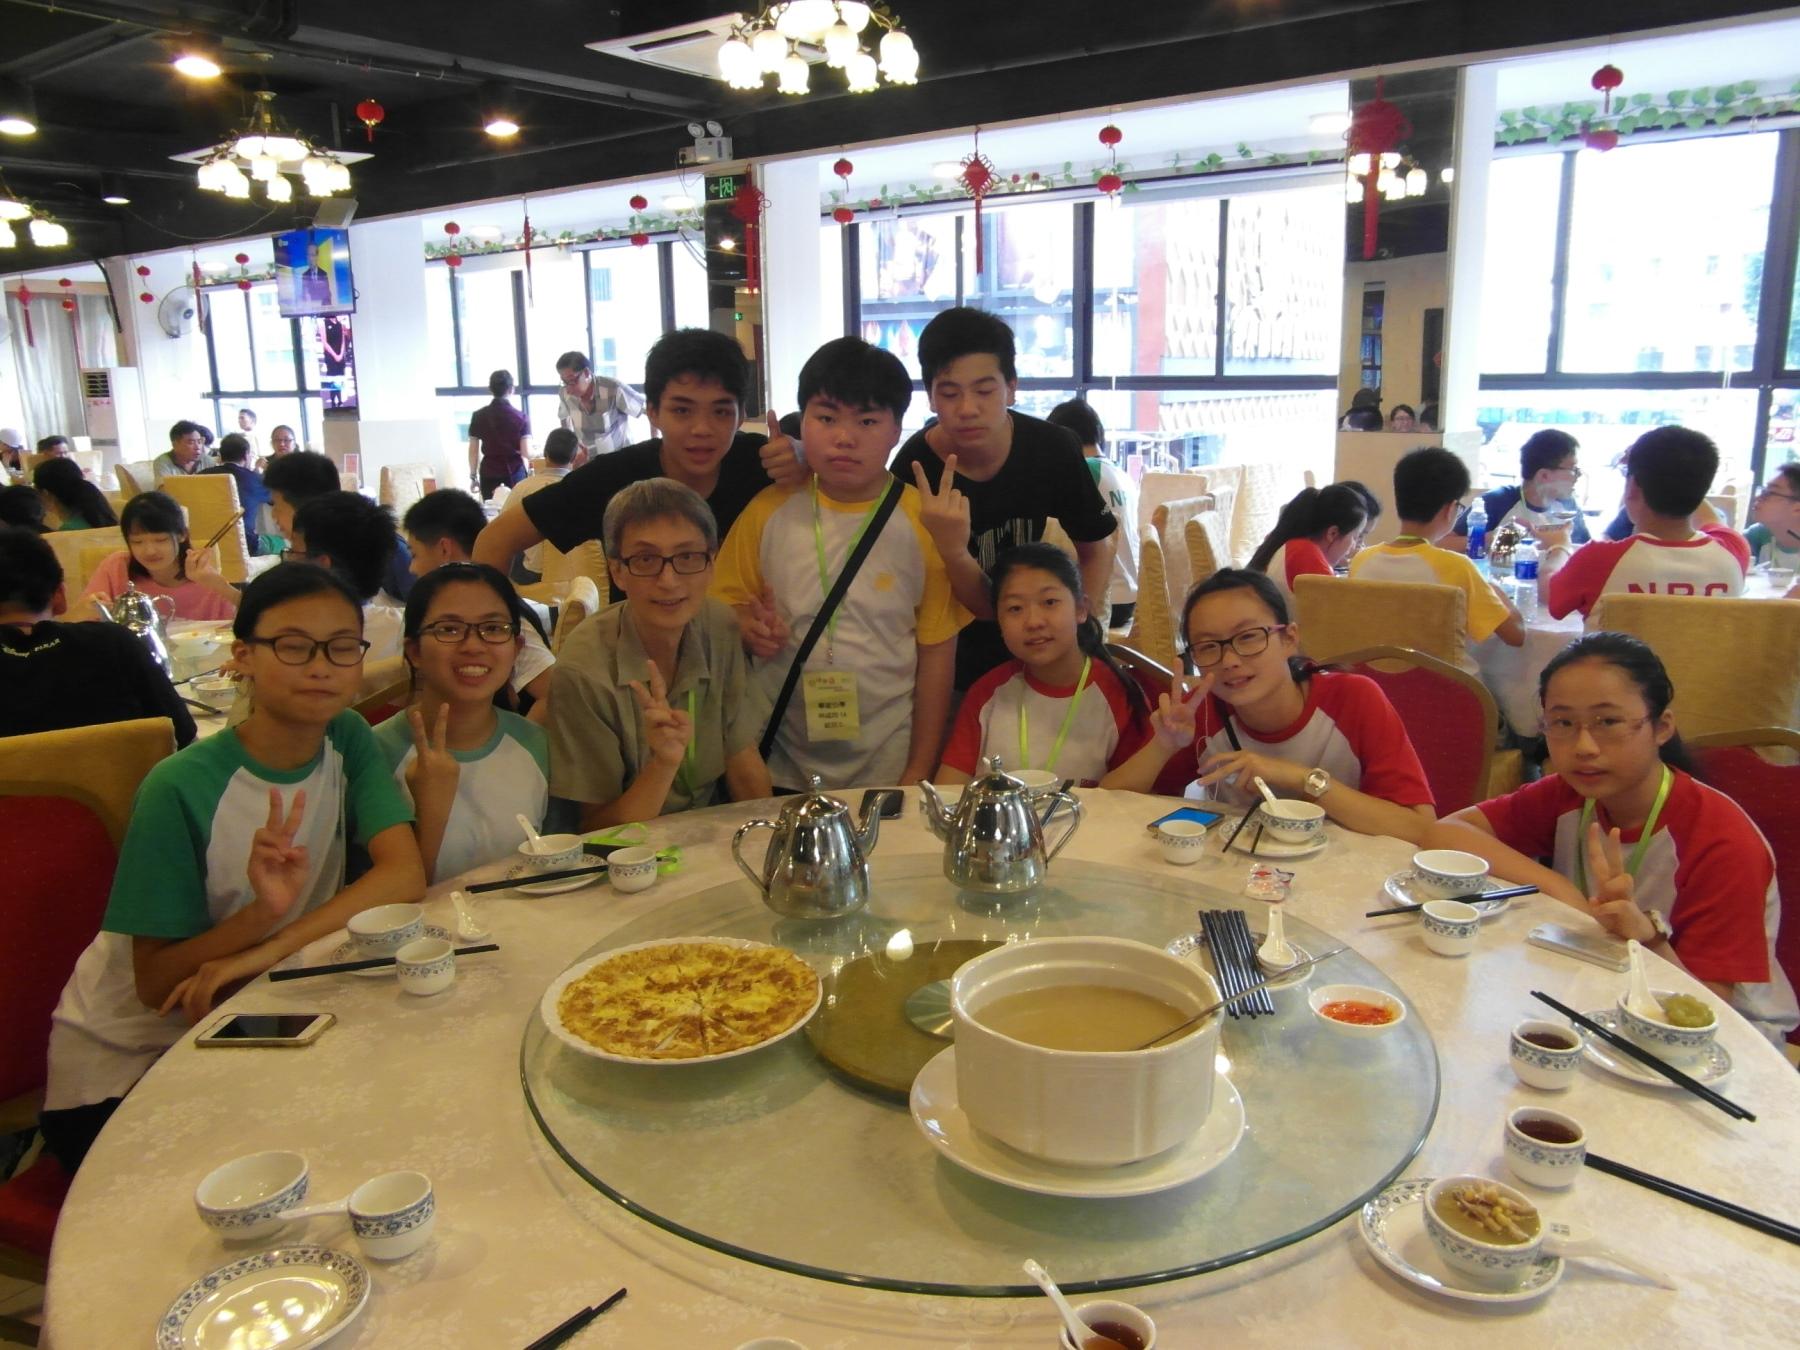 http://www.npc.edu.hk/sites/default/files/sam_4194.jpg